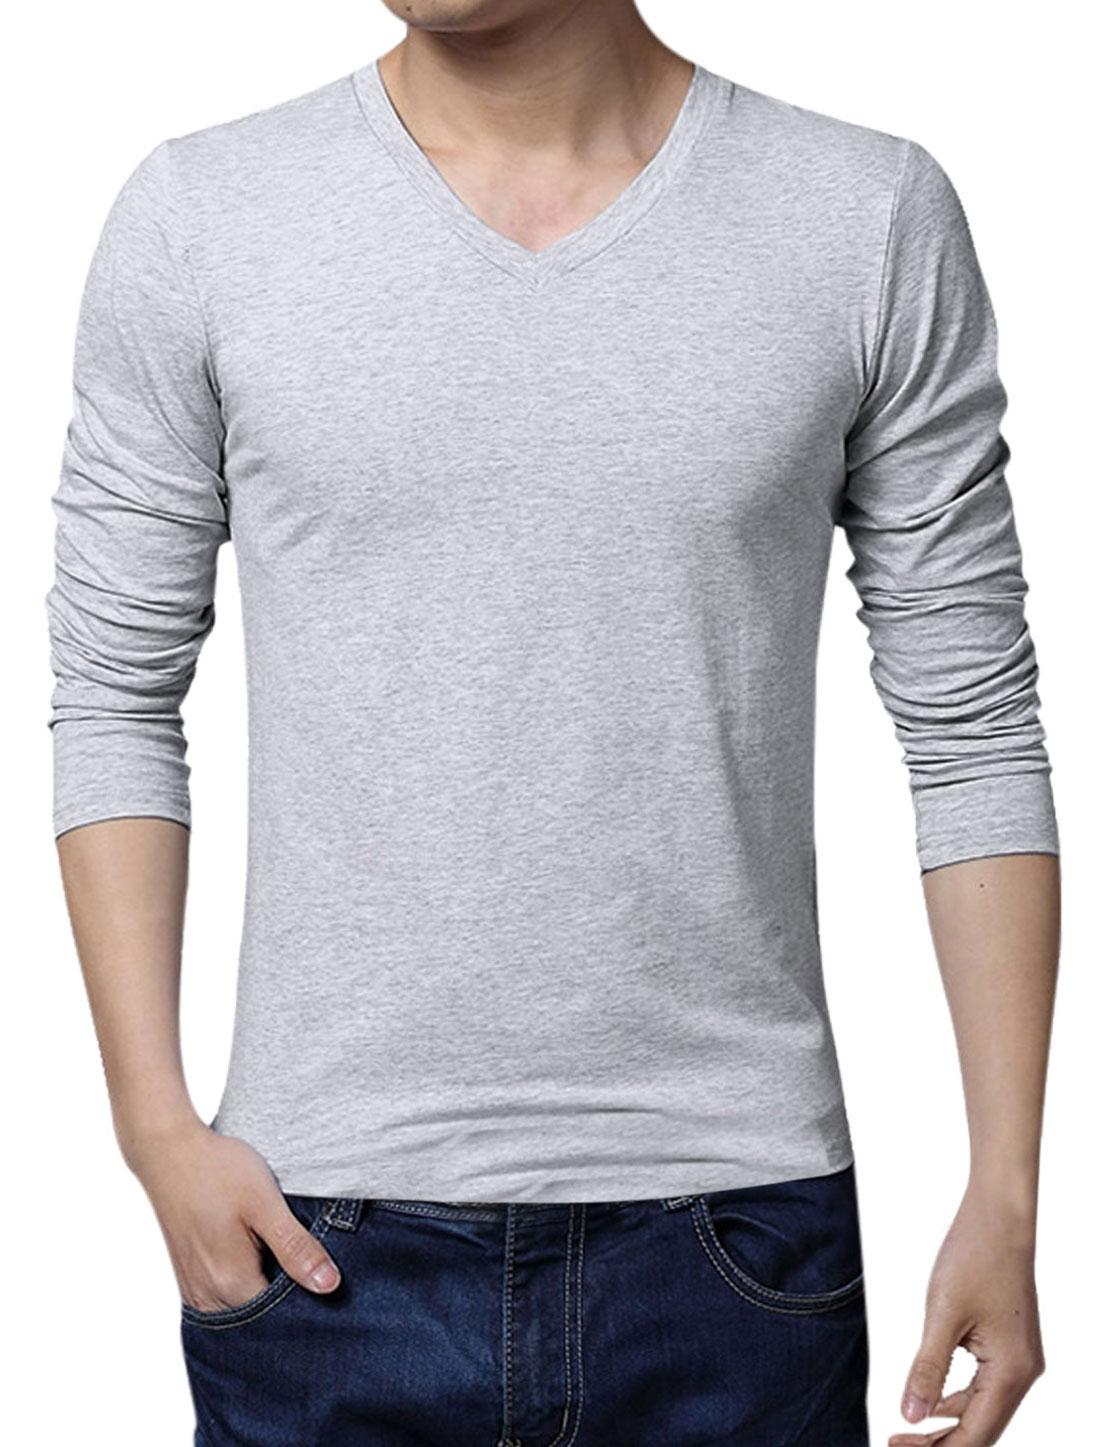 Men Stretchy V Neck Long Sleeve Slim Fit T-Shirt Light Gray L